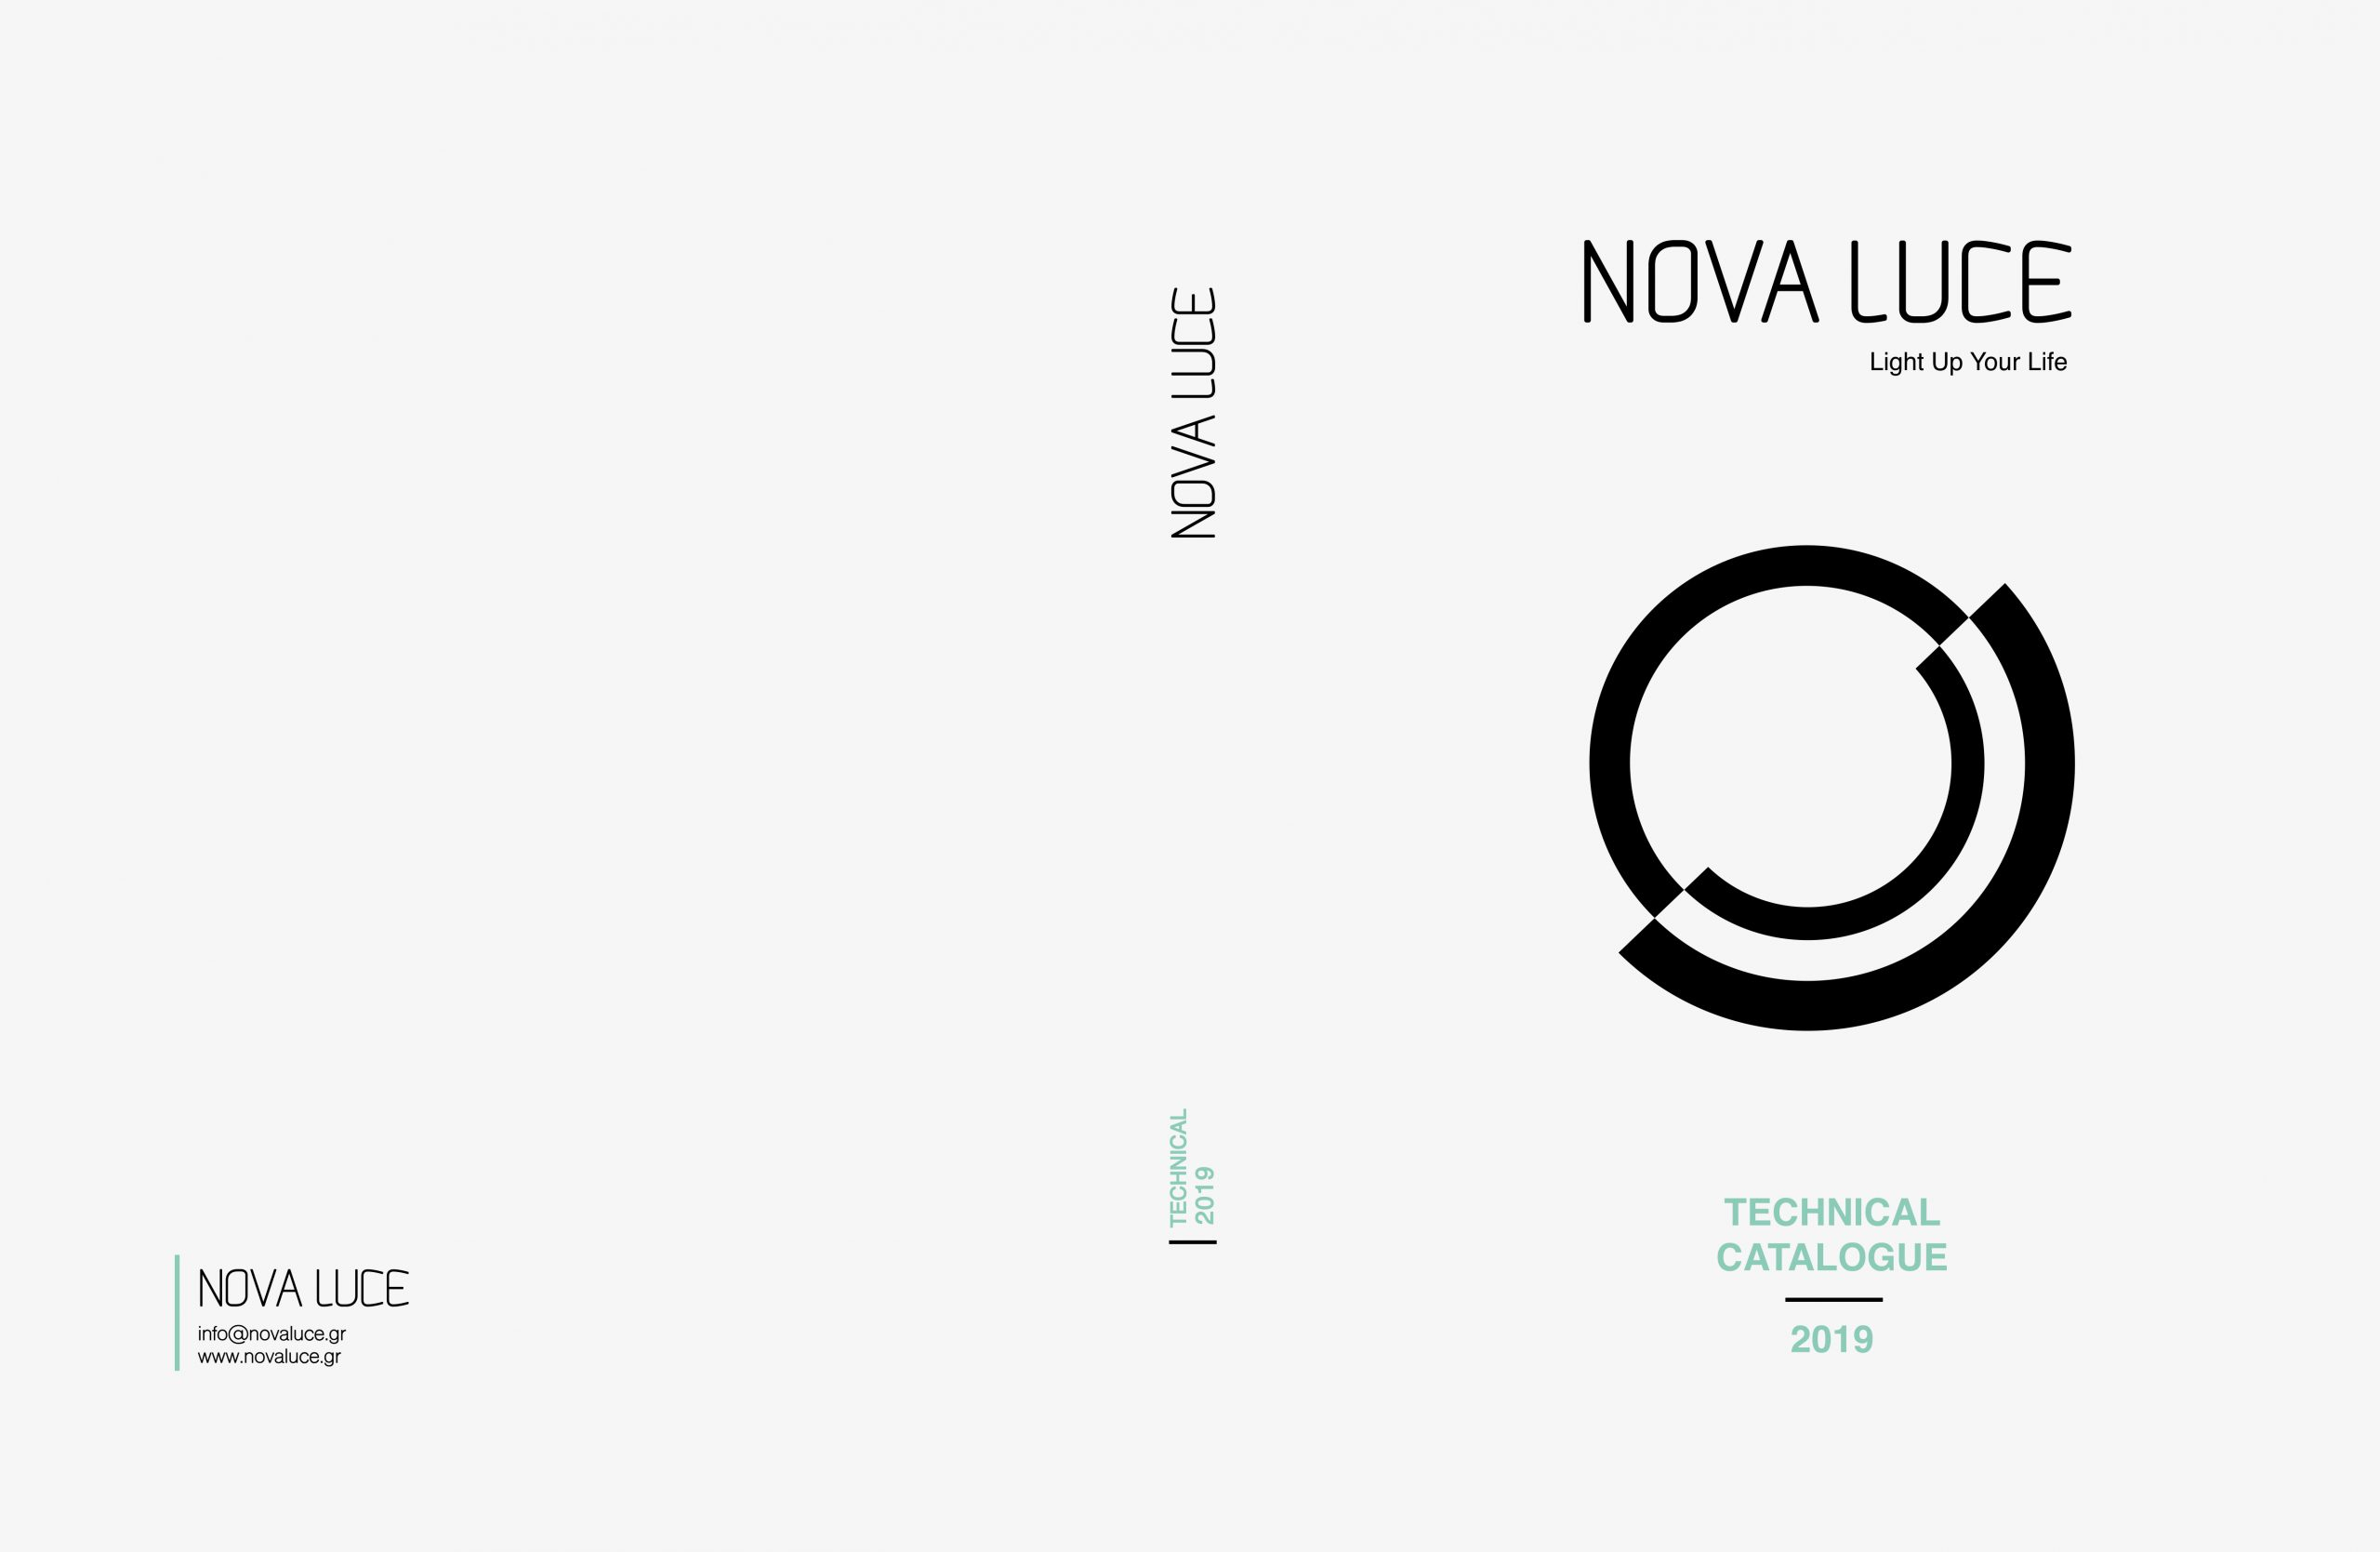 Nova Luce Technical Catalogue 2019-1